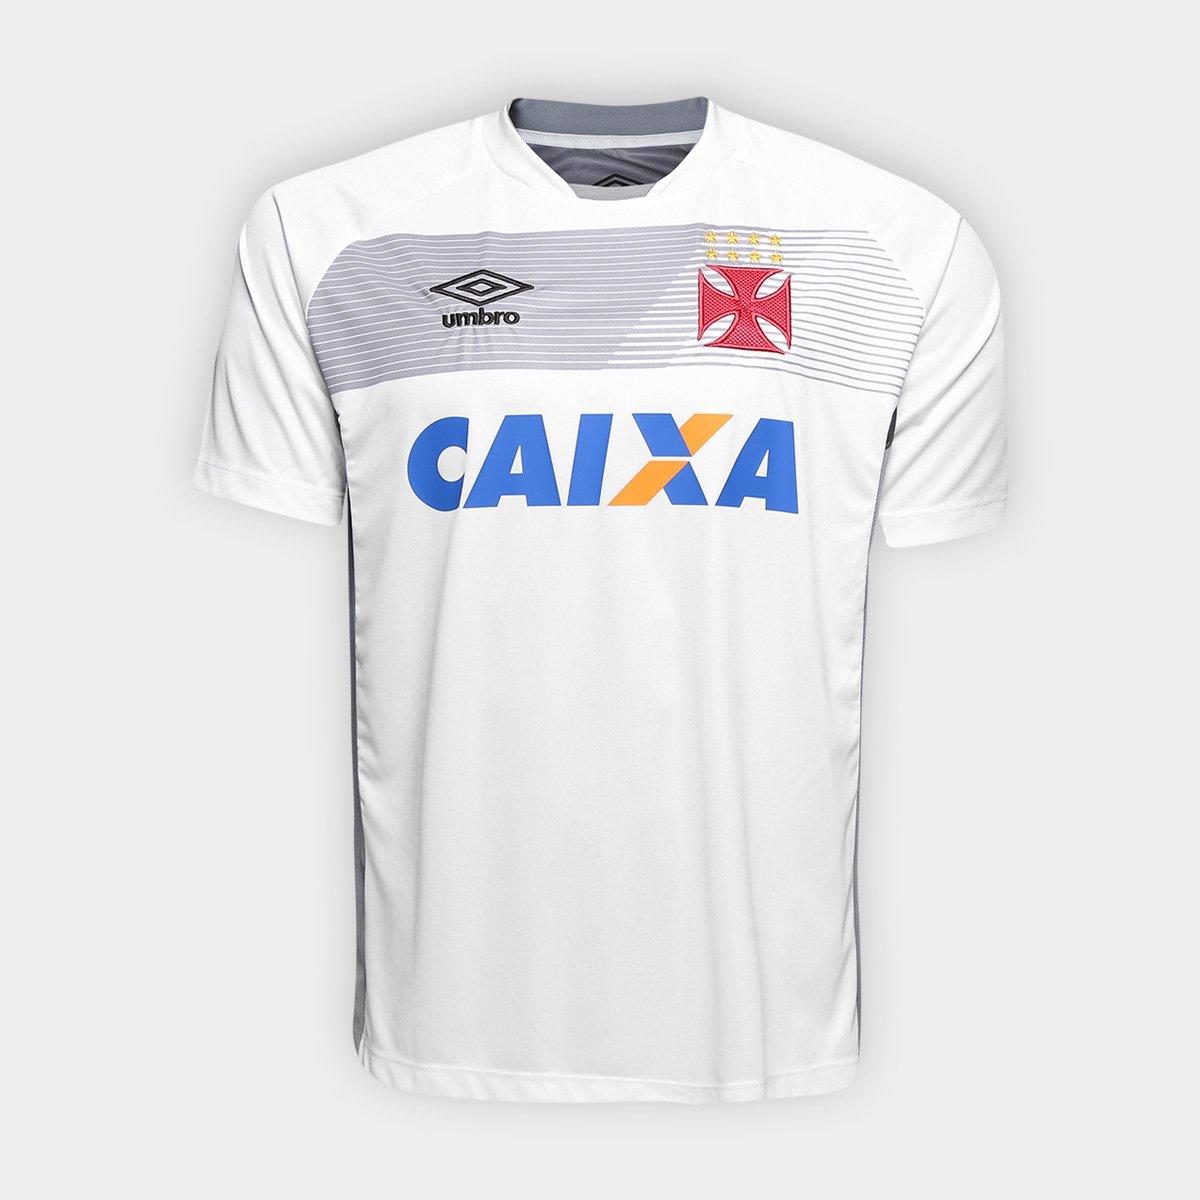 Camisa Treino Vasco 17 18 Umbro Masculina - Compre Agora  4db4f0c90d511